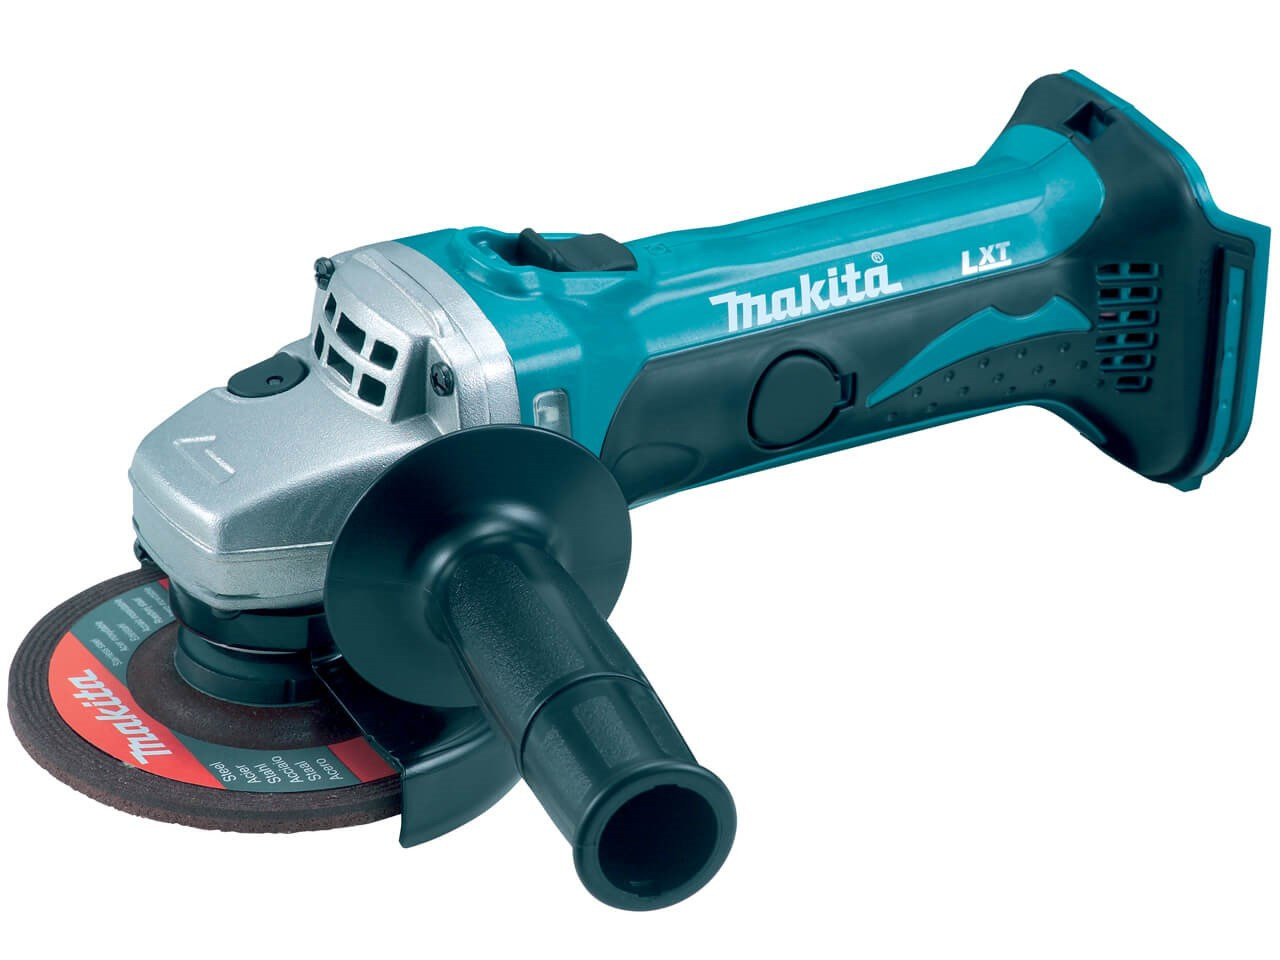 Makita DGA452Z 18V 115mm Angle Grinder BODY ONLY